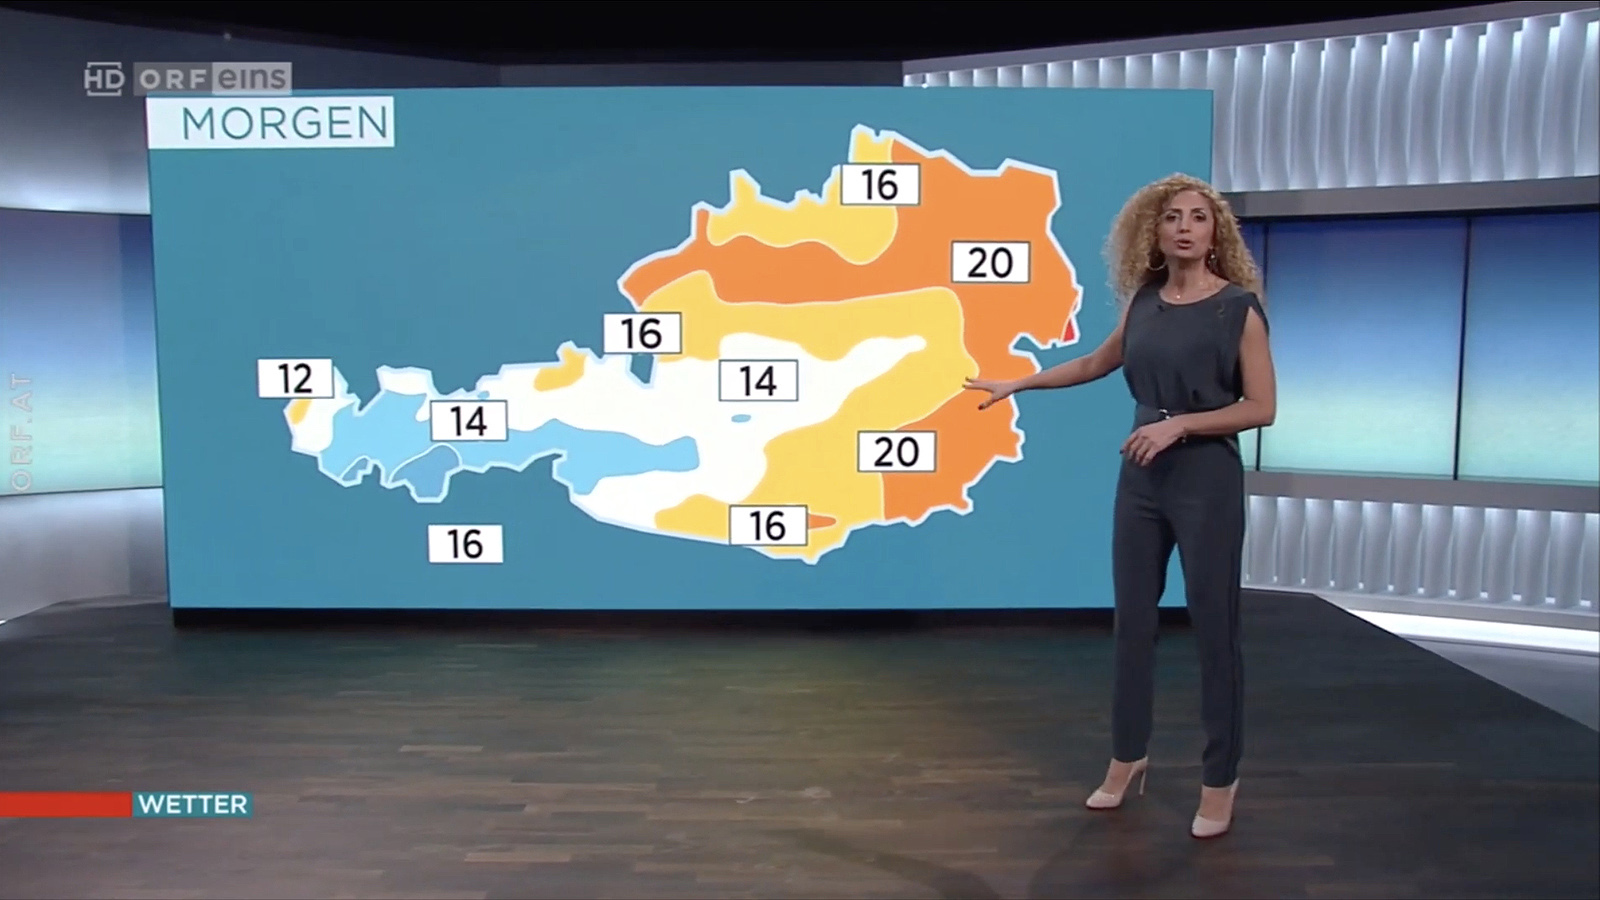 NCS_ORF-Veech-2019_0021